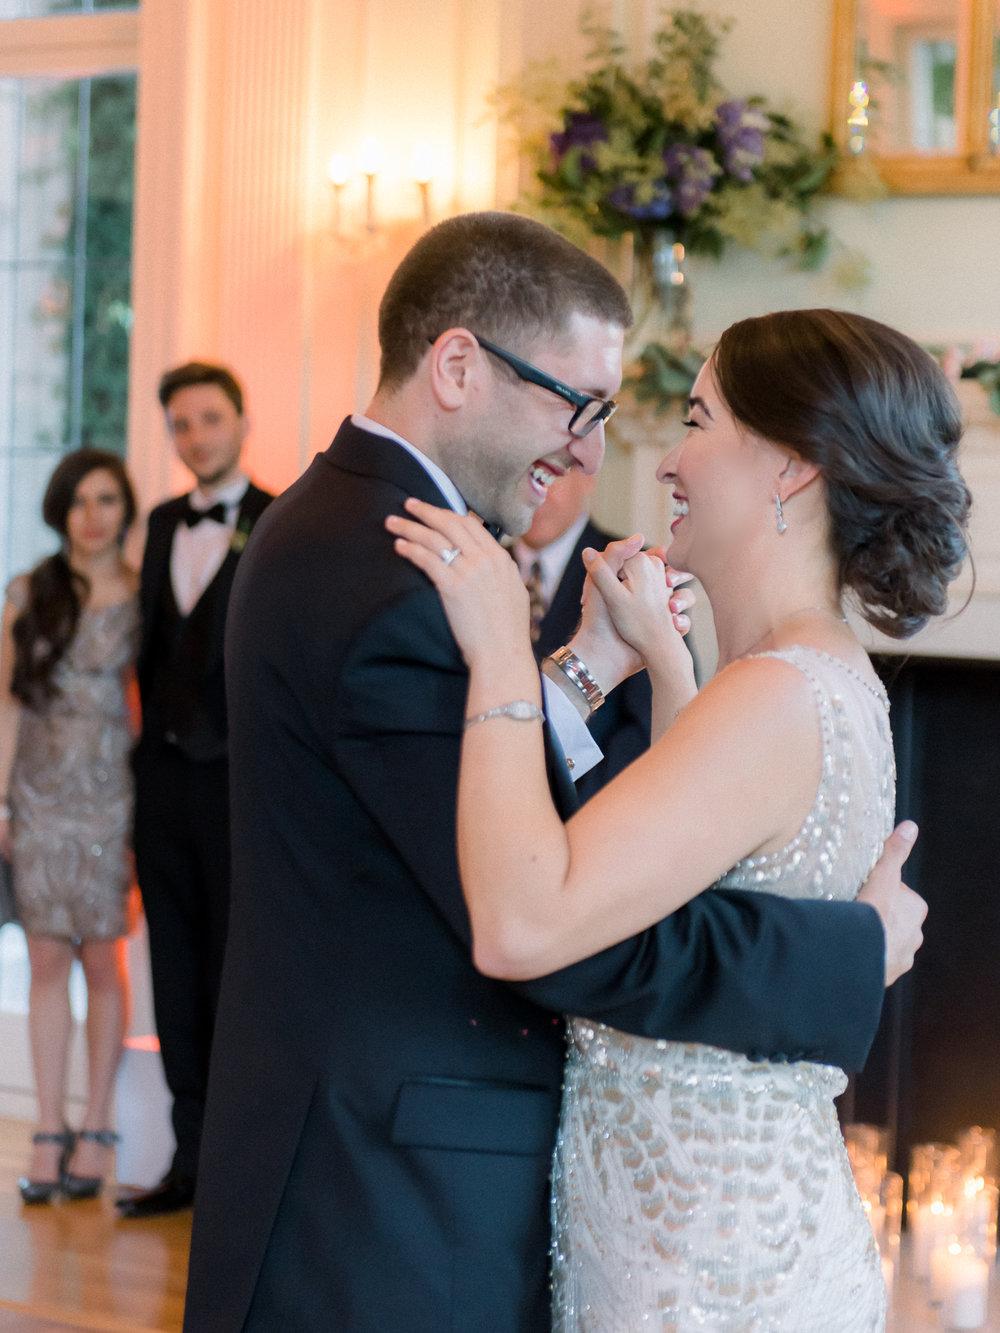 Sarah+Warren_wedding_spp-149.jpg